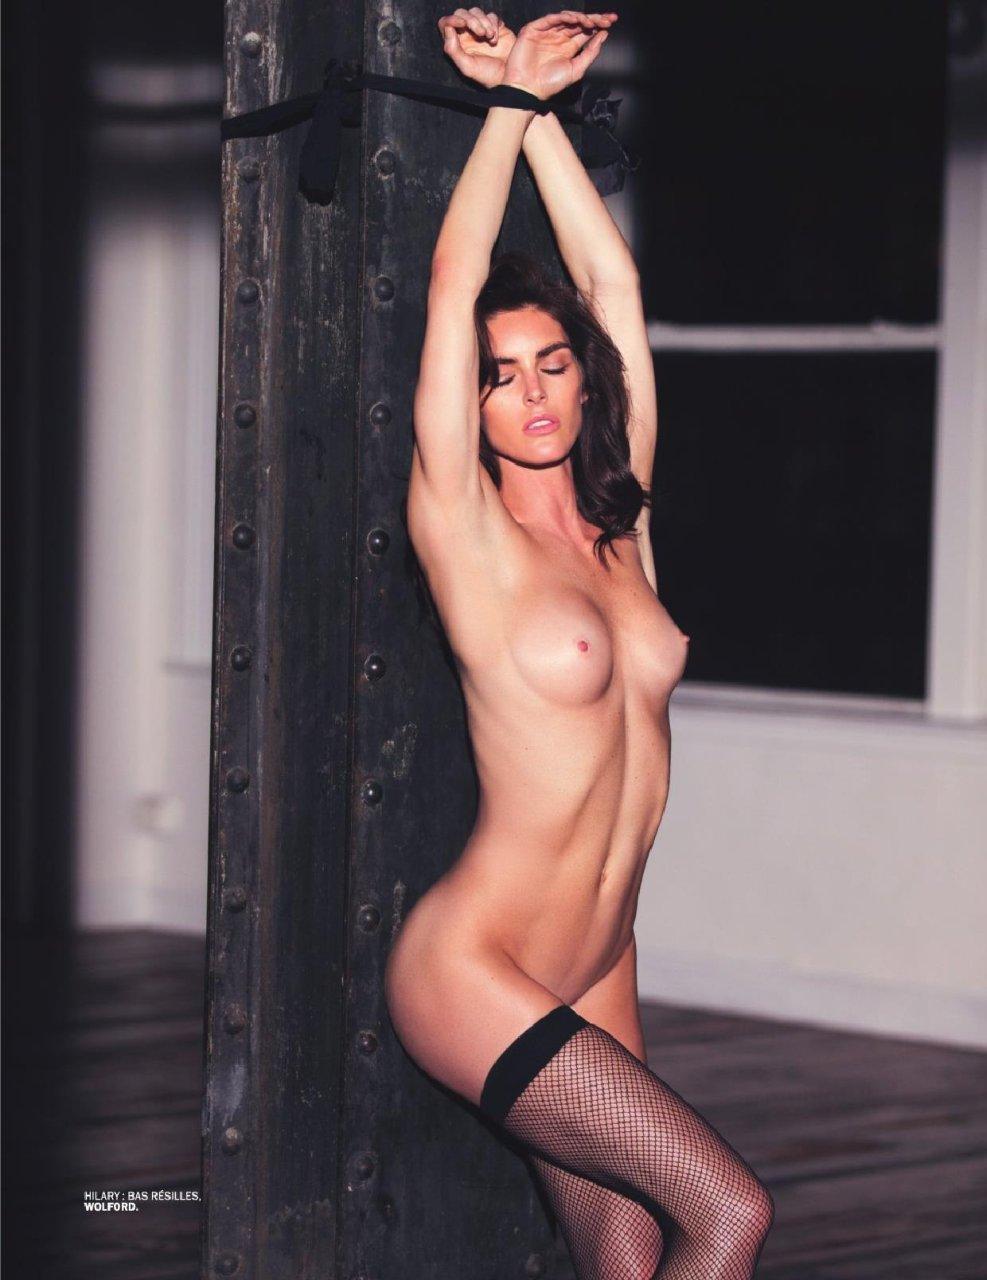 nude pics of porn model hilary rhoda